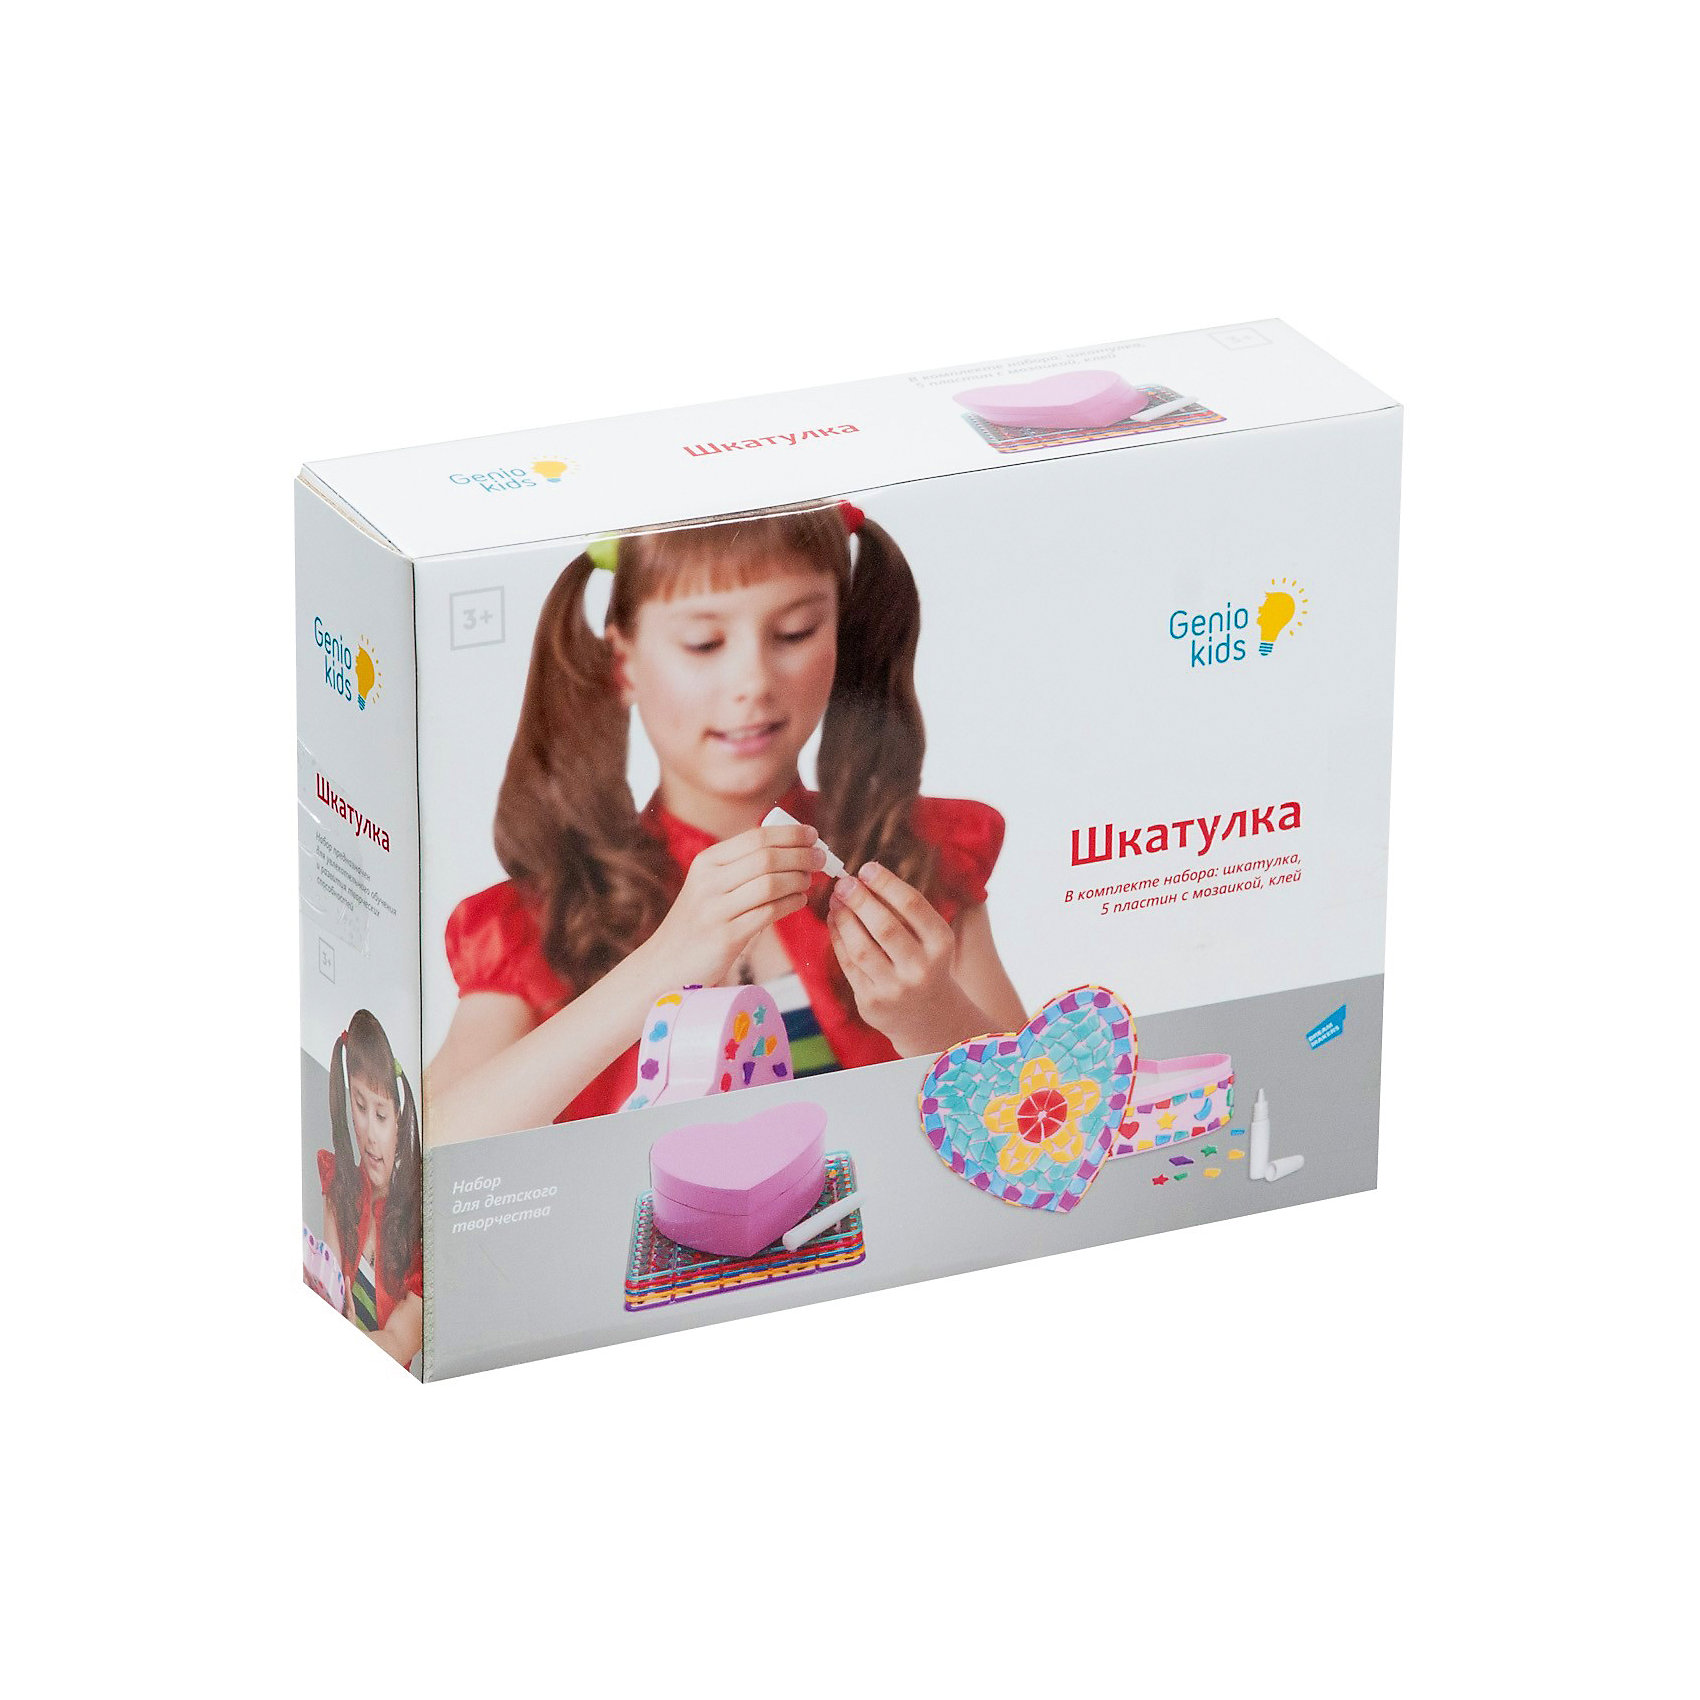 "Genio Kids Набор для детского творчества ""Шкатулка"" genio kids набор для детского творчества ""шкатулка"""